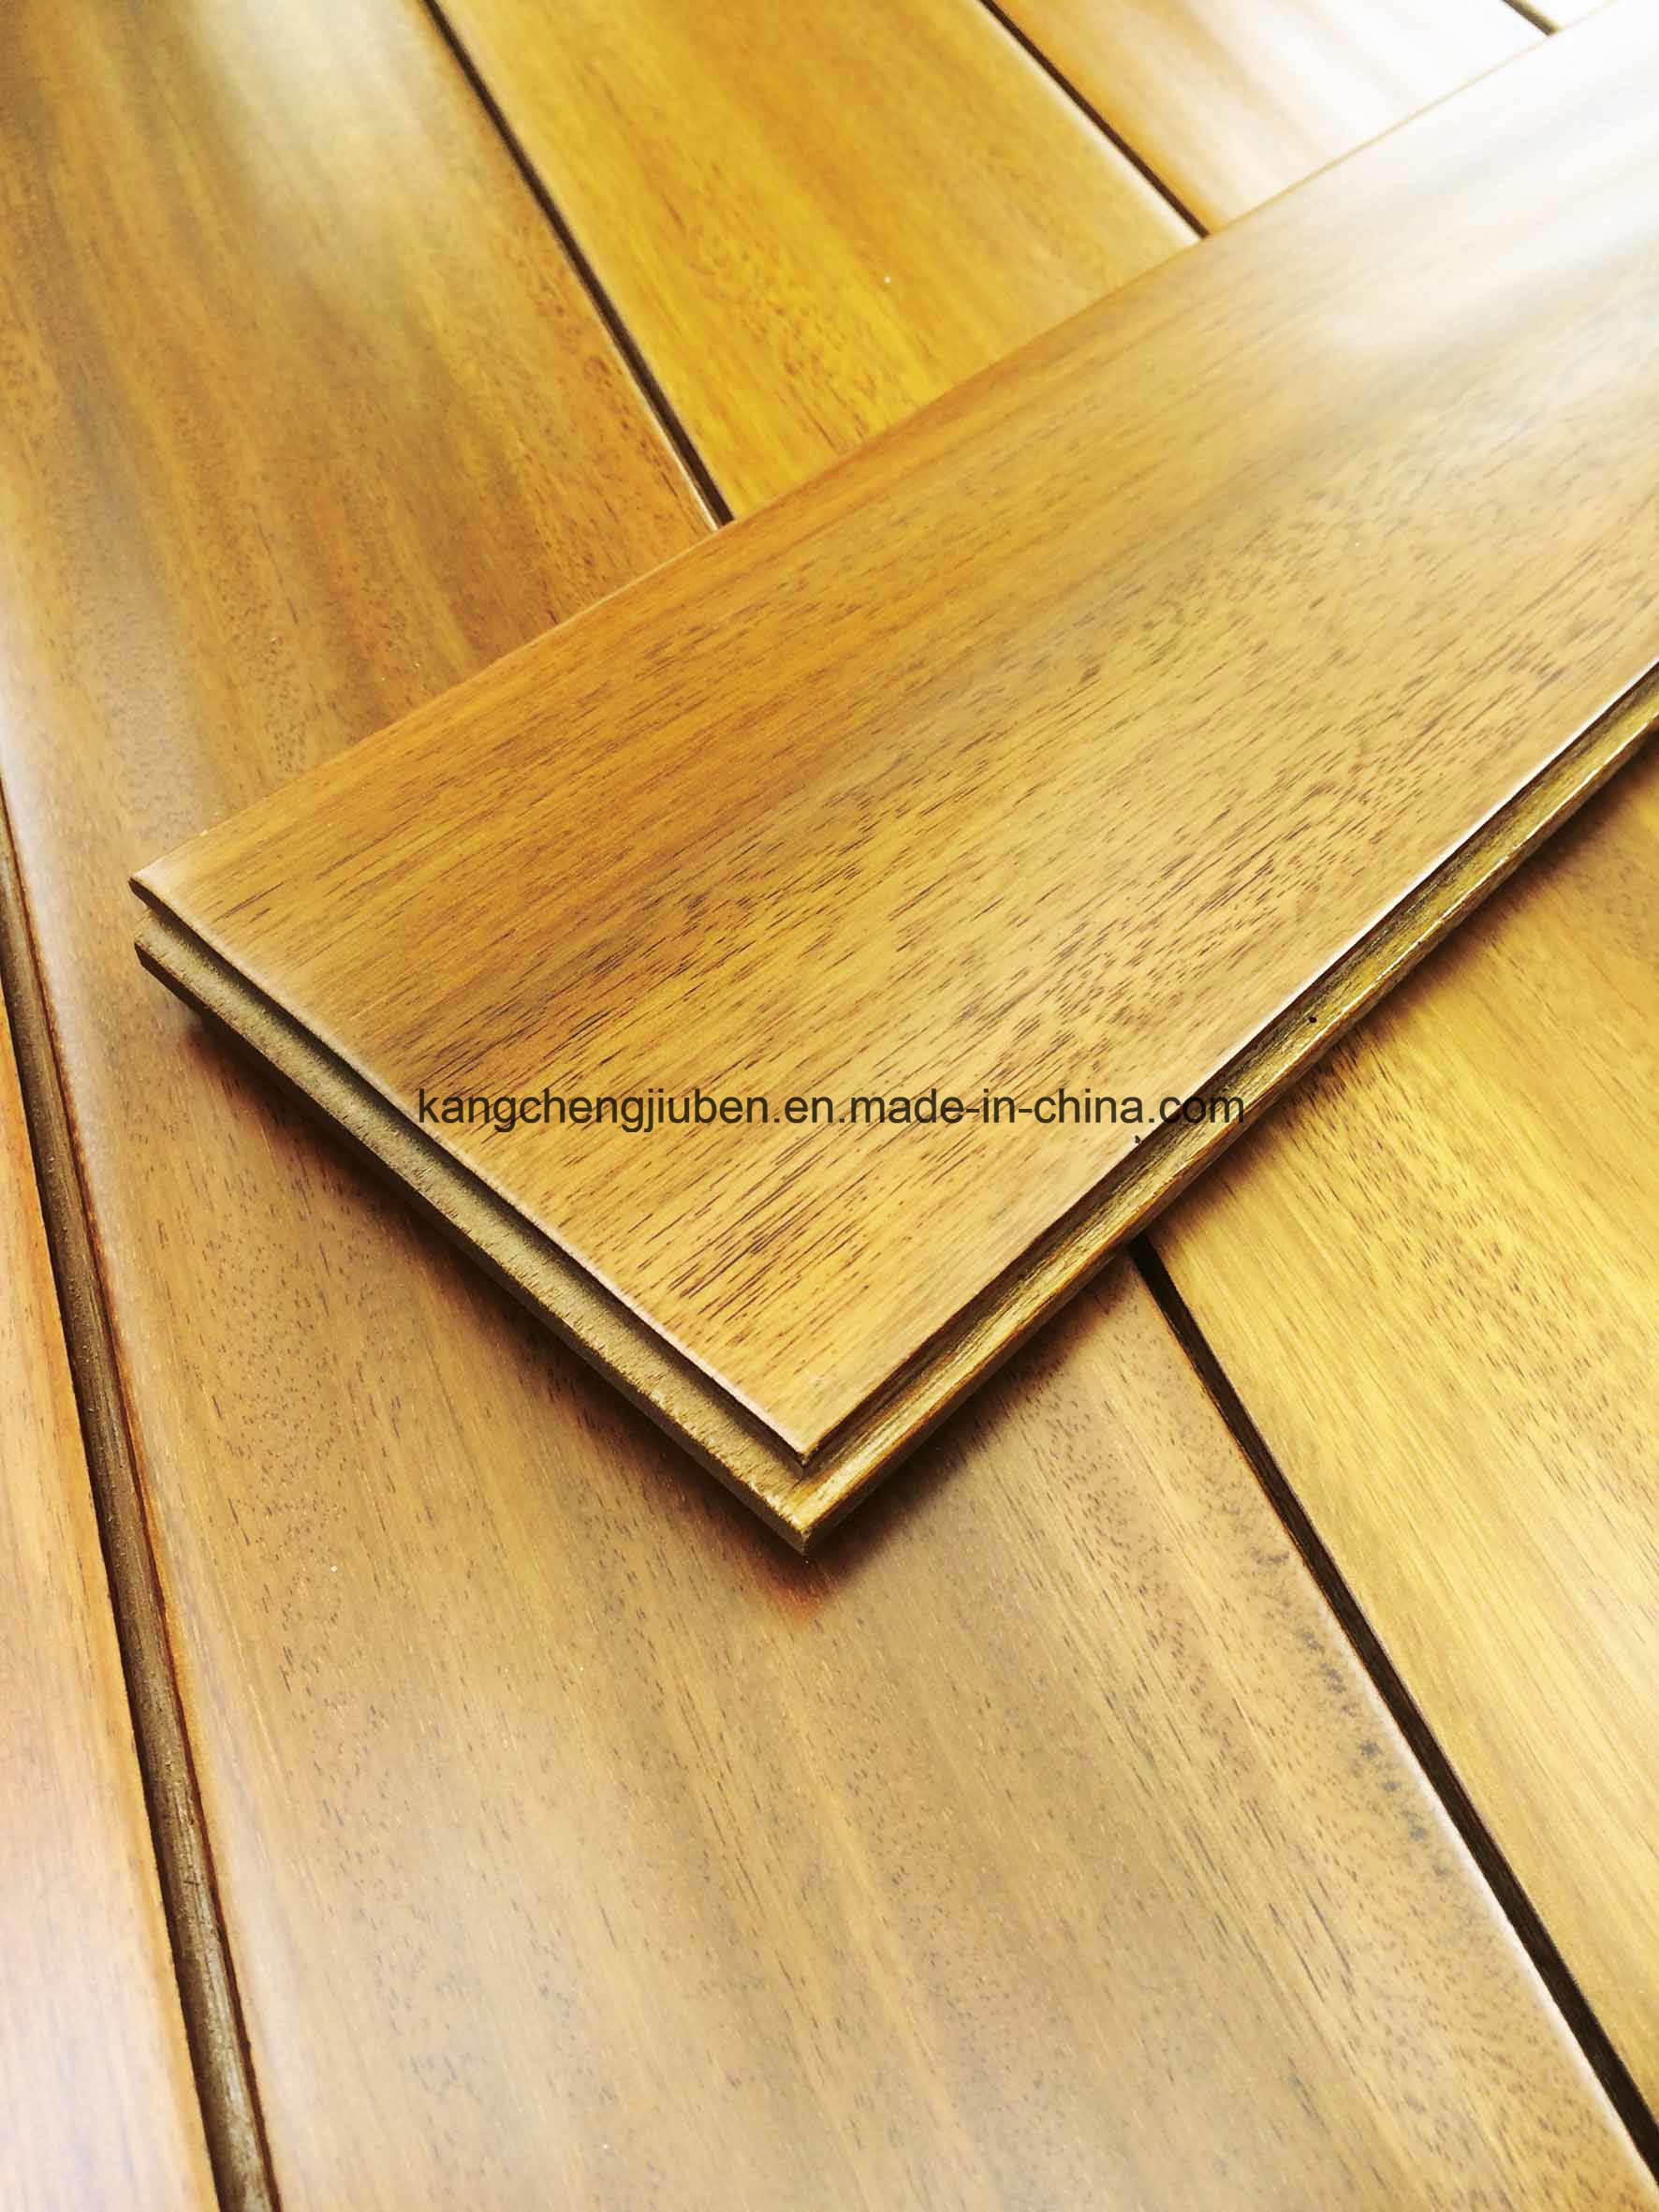 A Grade Wood Parquet/Hardwood Flooring (MD-01)